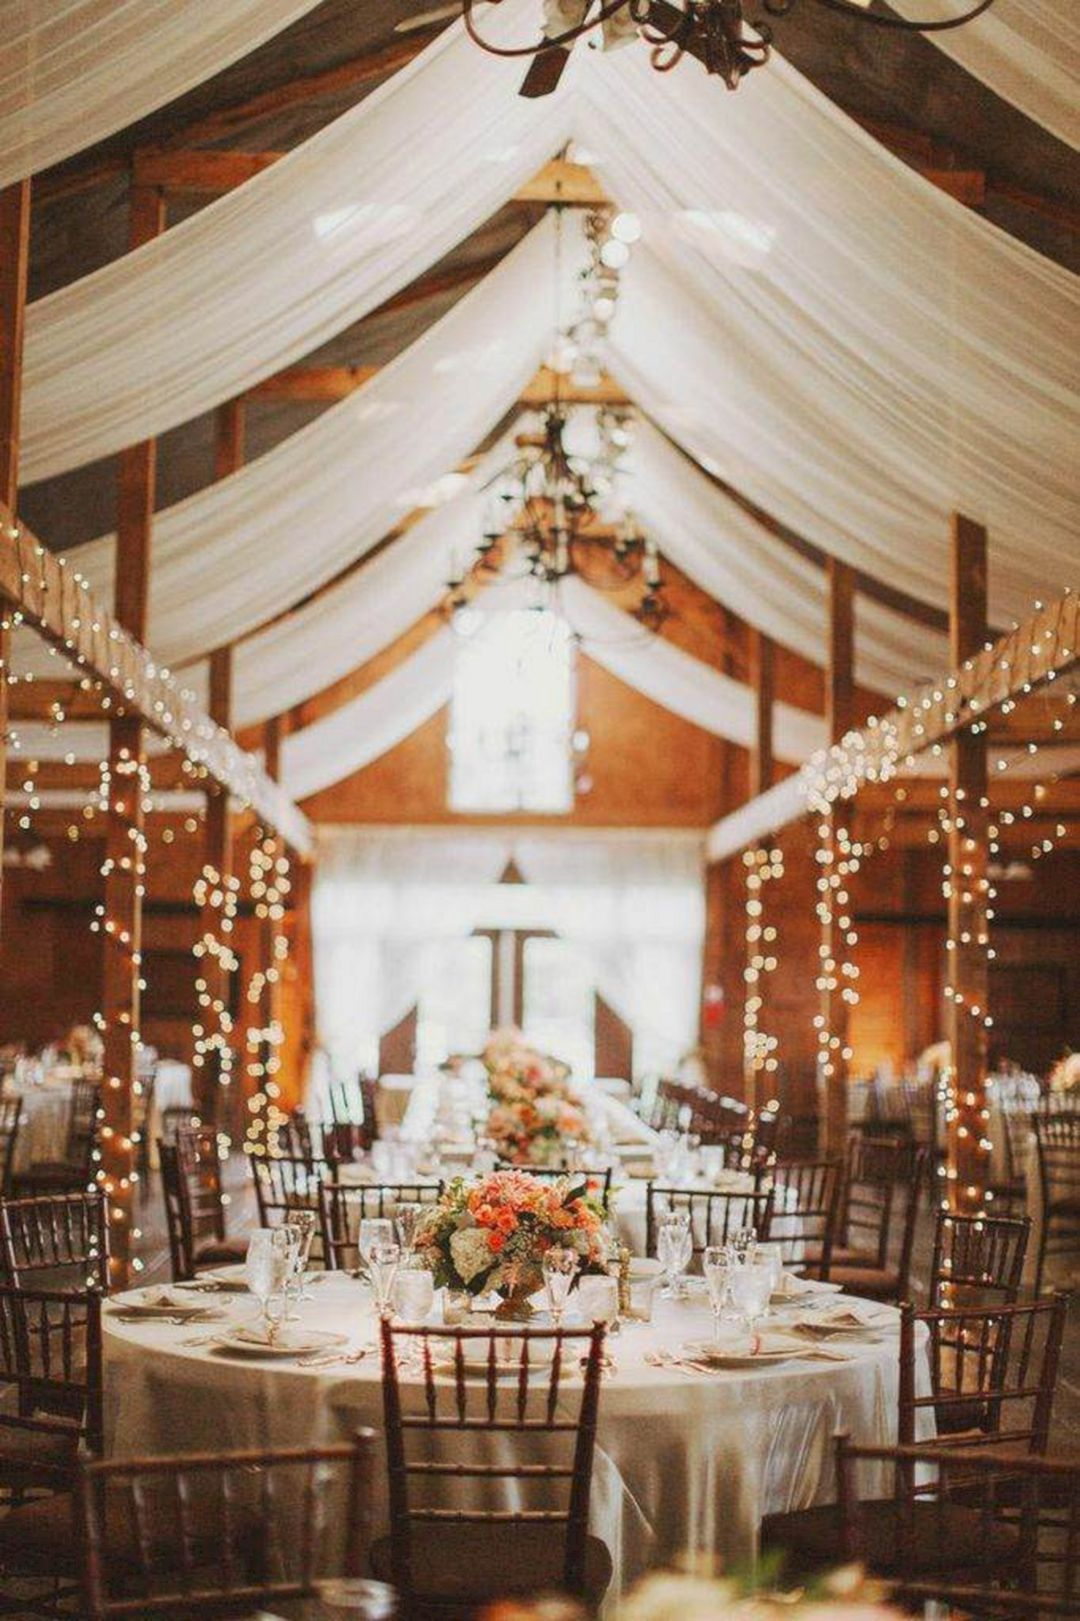 8 Amazing Barn Wedding Venue Decorations For Amazing Wedding Memories Virginia Wedding Venues Barn Wedding Decorations Wedding Themes Summer